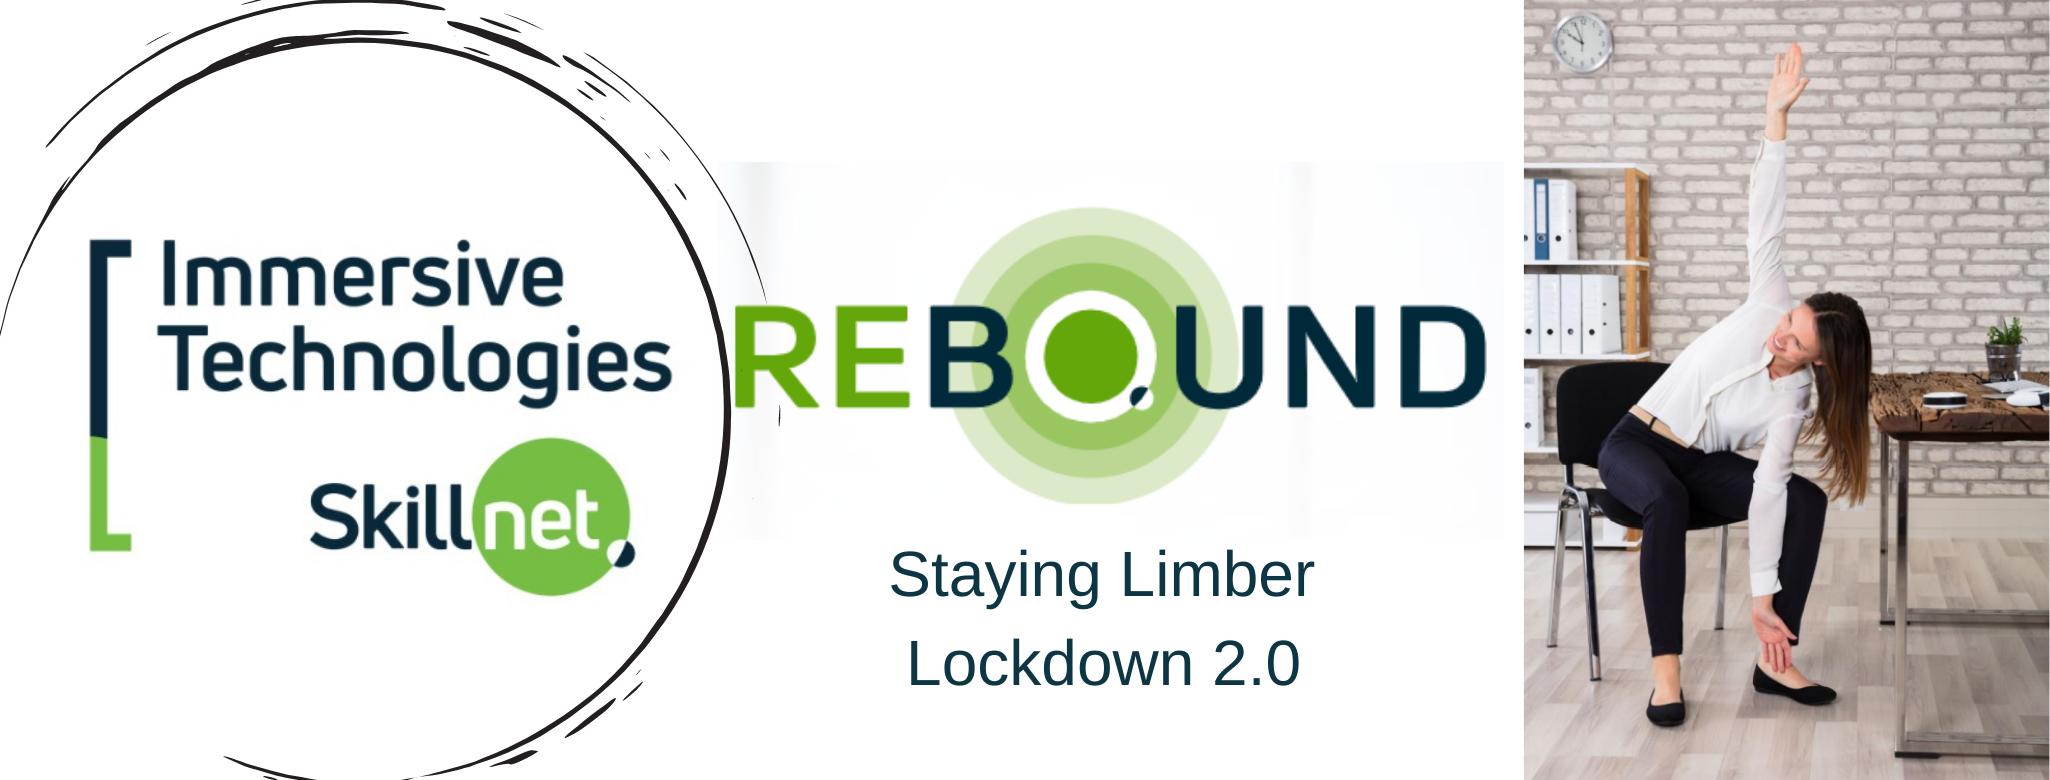 Immersive Technologies Skillnet Staying Limber Lockdown 2.0